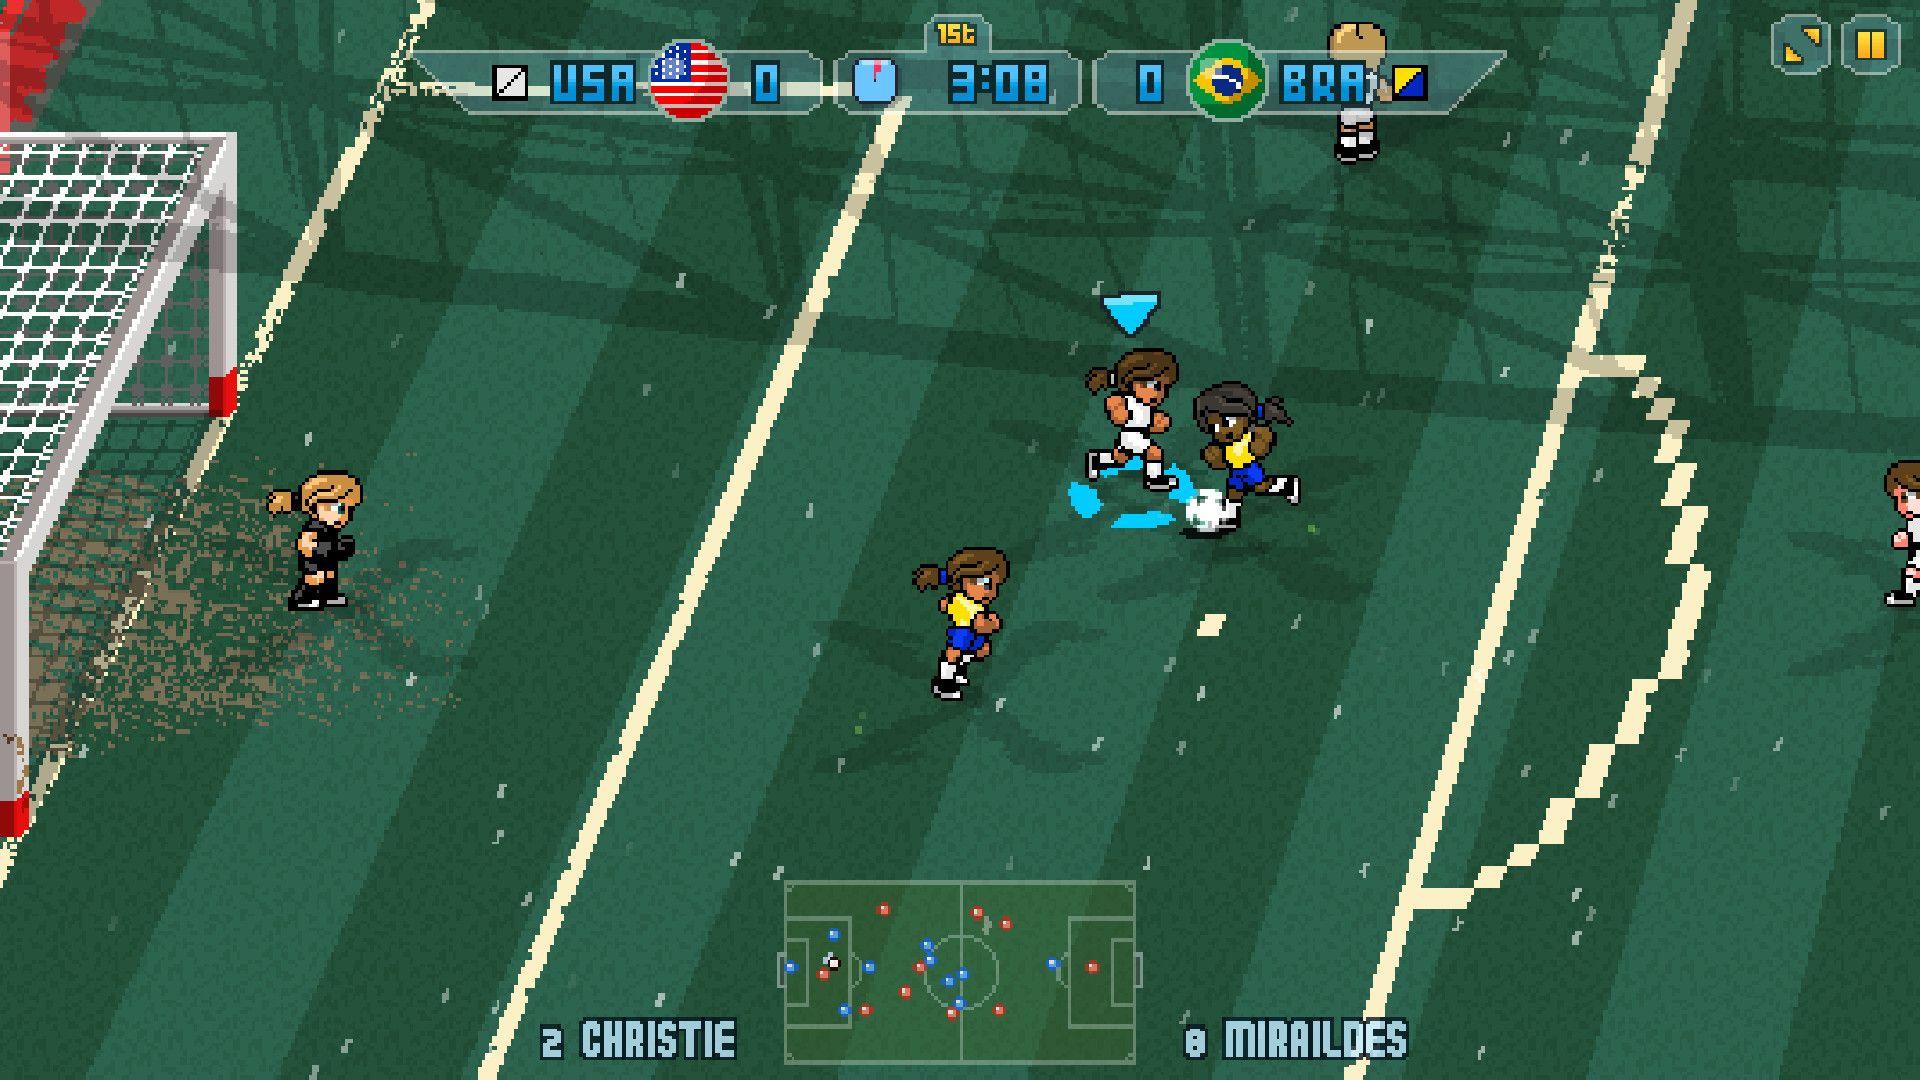 pixel-cup-soccer-17-screenshot-01